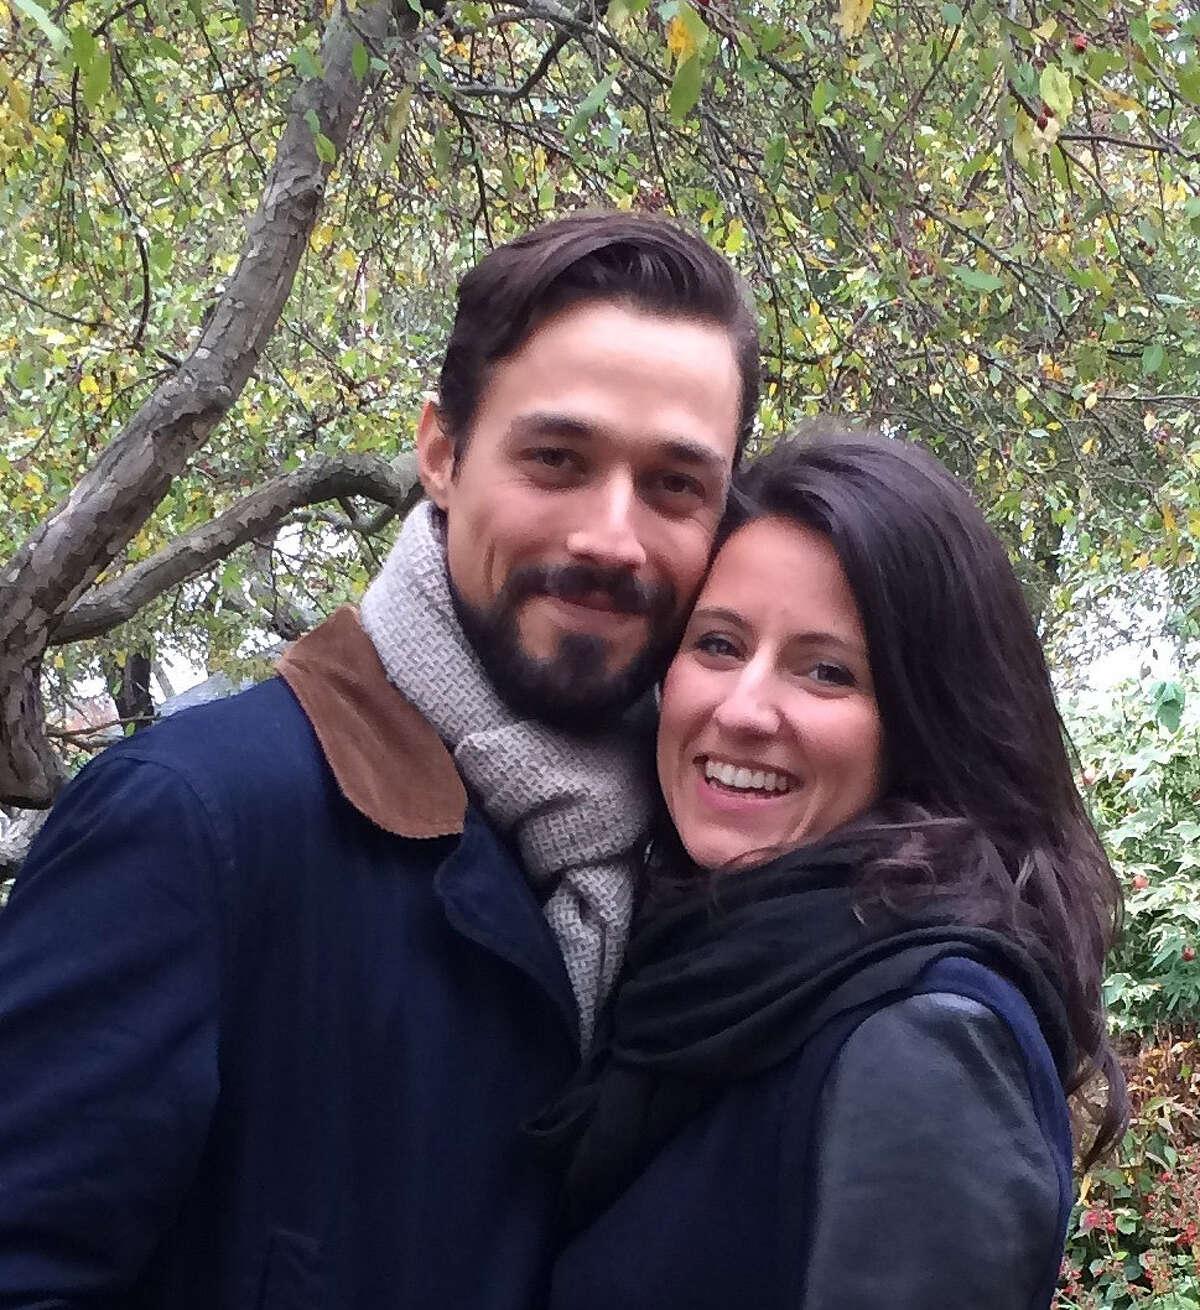 Kyle Engtrom and Graciela Monroy of Brooklyn. (Provided photo)